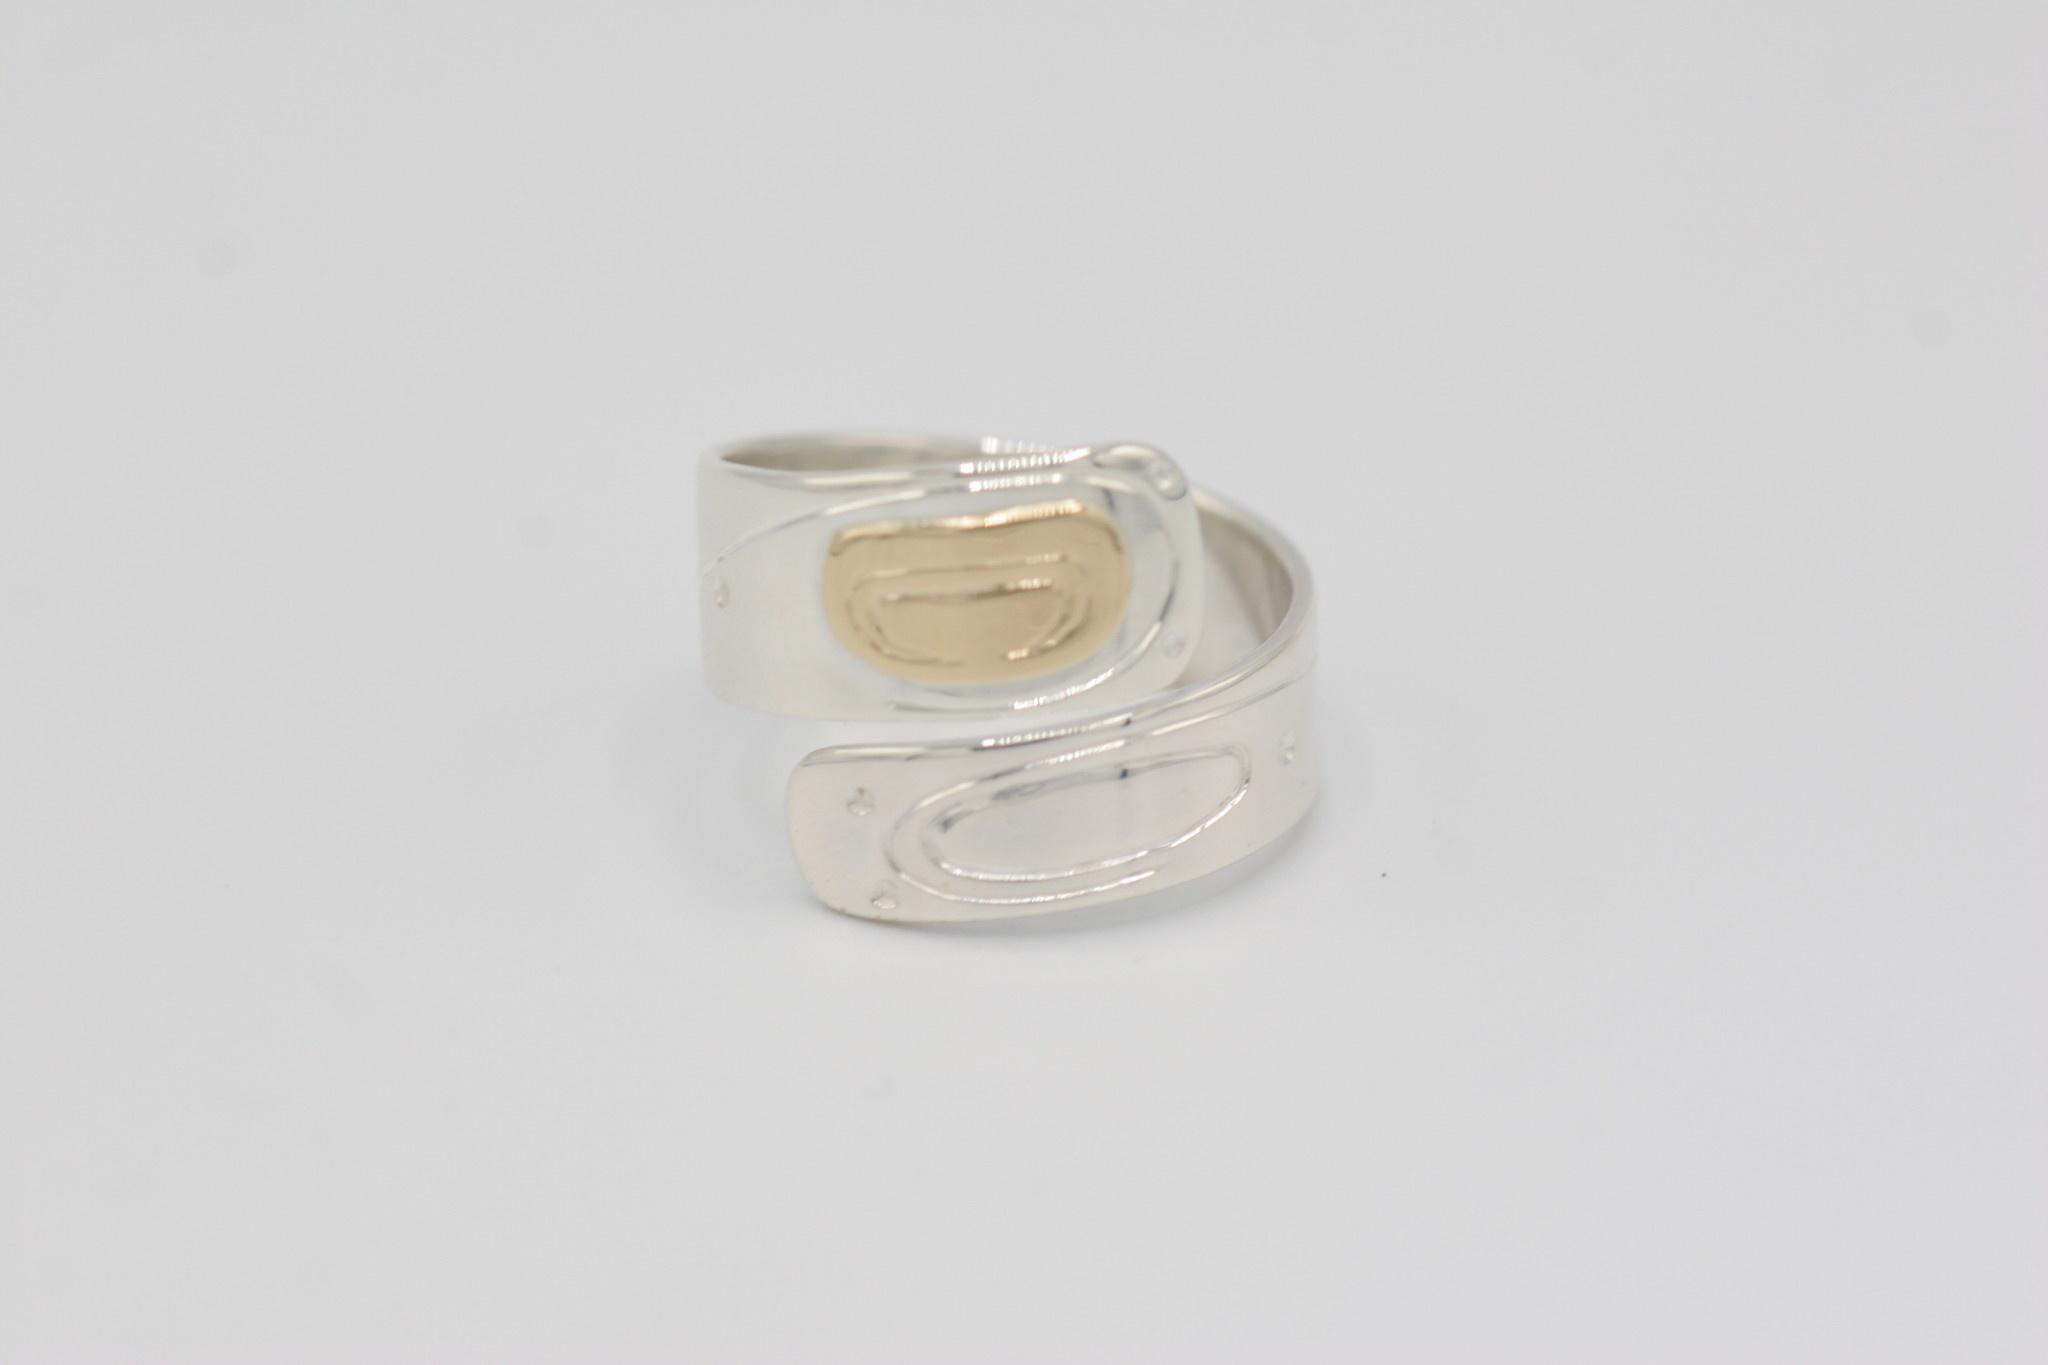 Walter Davidson Ring - Eye Catcher Wrap, S/S, 14K